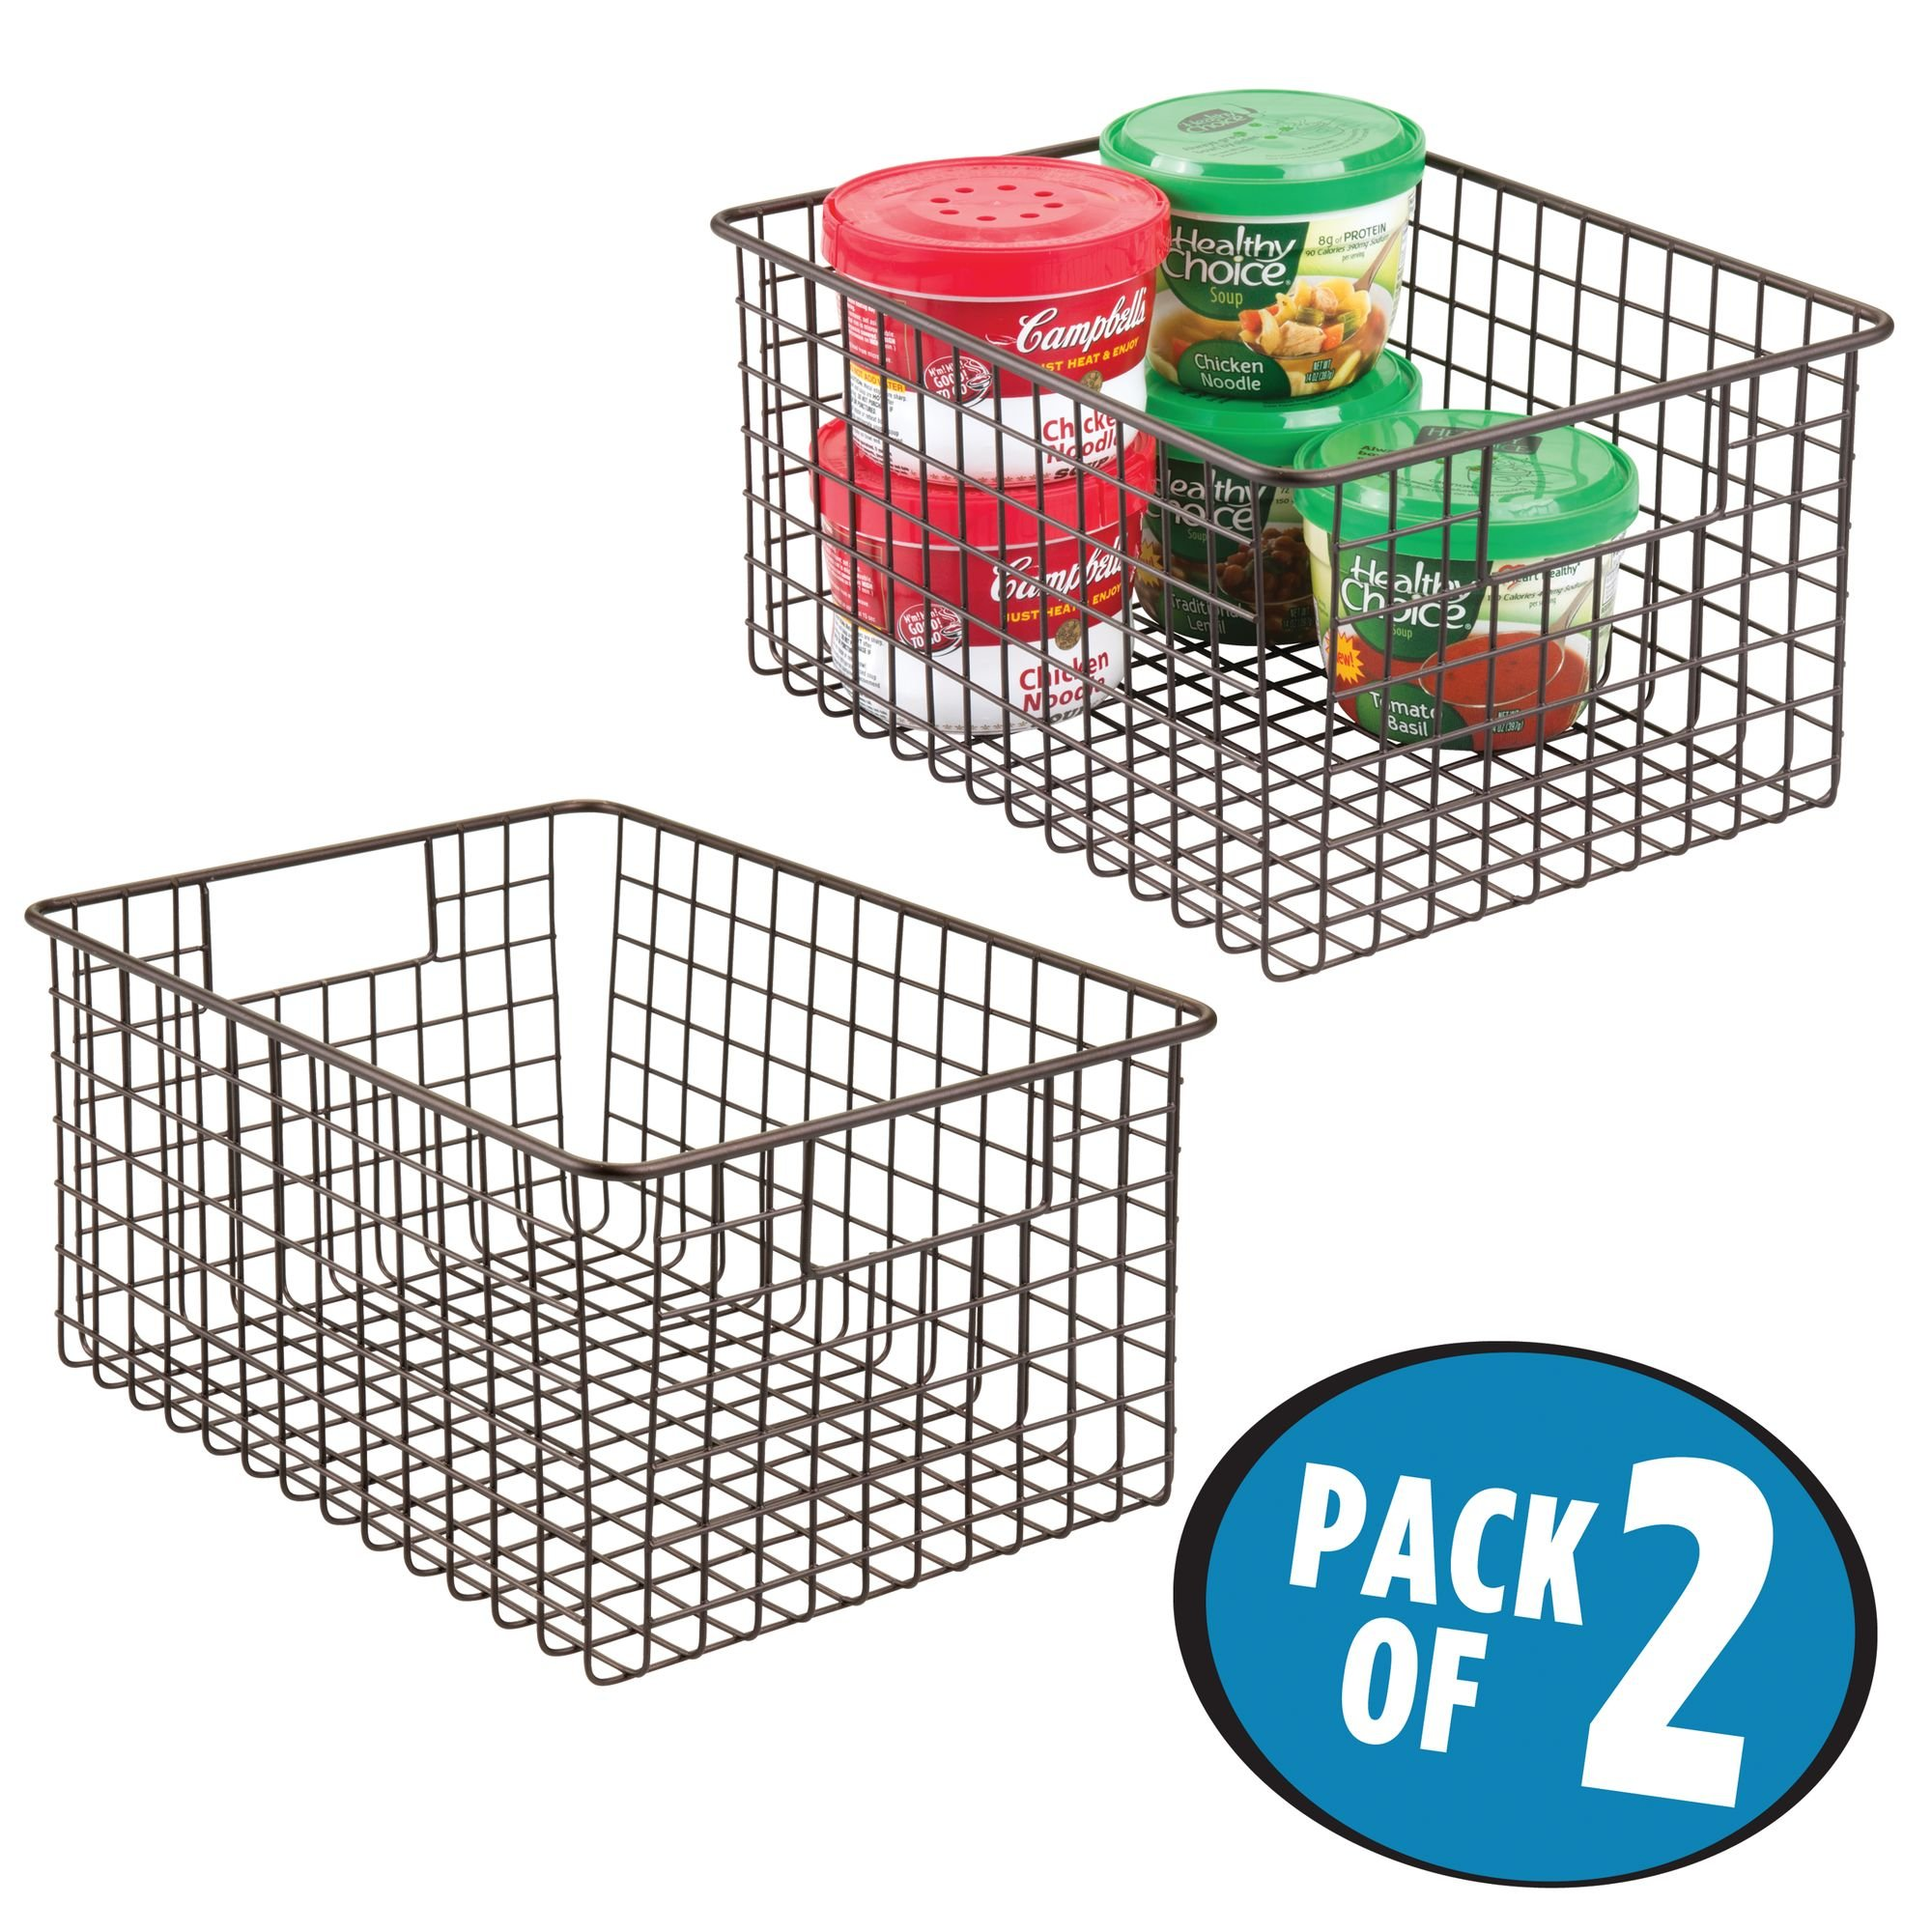 mDesign Kitchen Pantry Bathroom Office Garage Freezer Food Shelf Storage Organizer Heavy Duty Metal Wire Mesh Bins Baskets with Handles, 12'' x 9'' x 6'' - Set of 2, Bronze